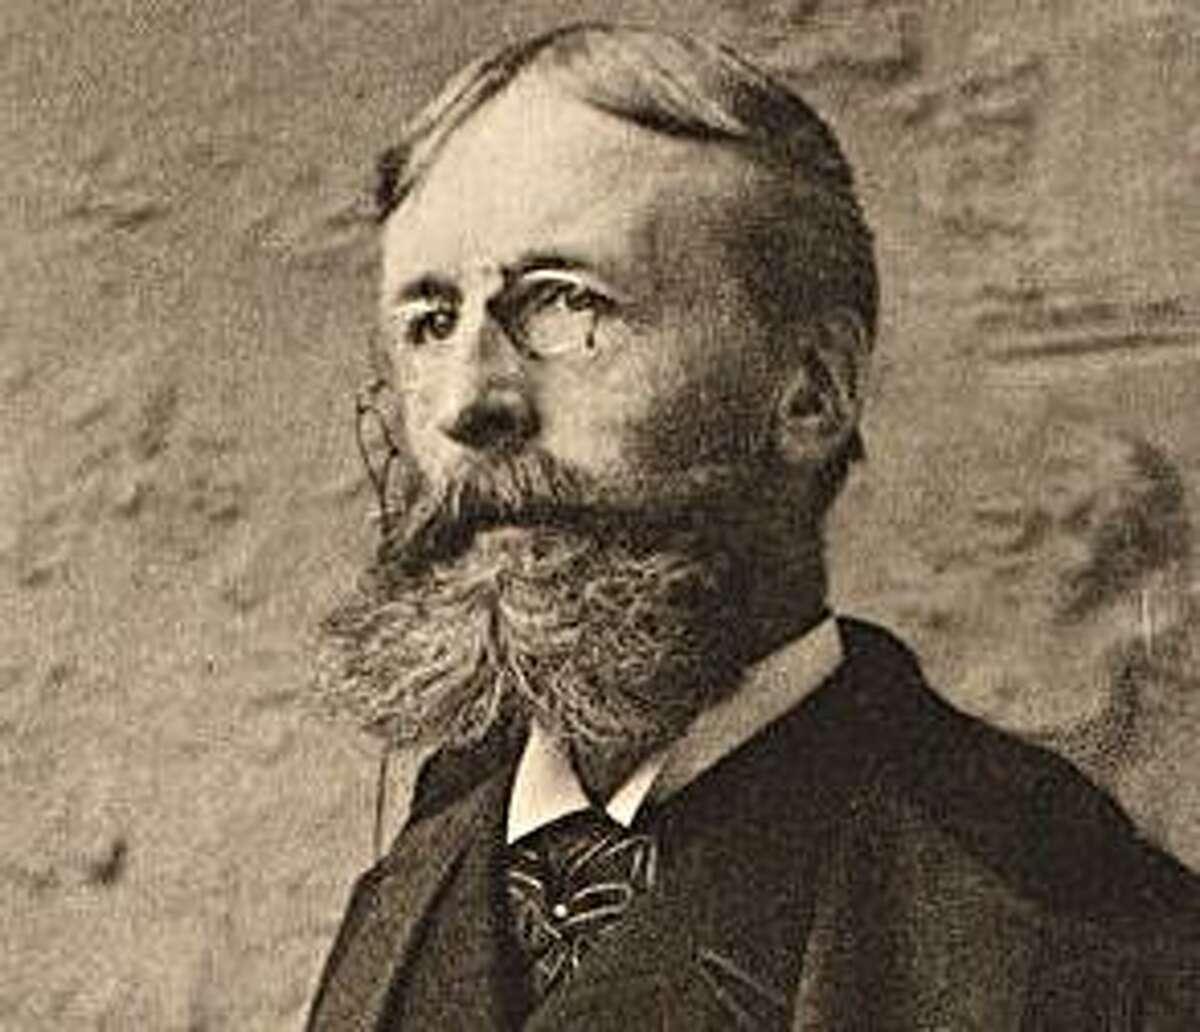 Artist George Henry Smillie